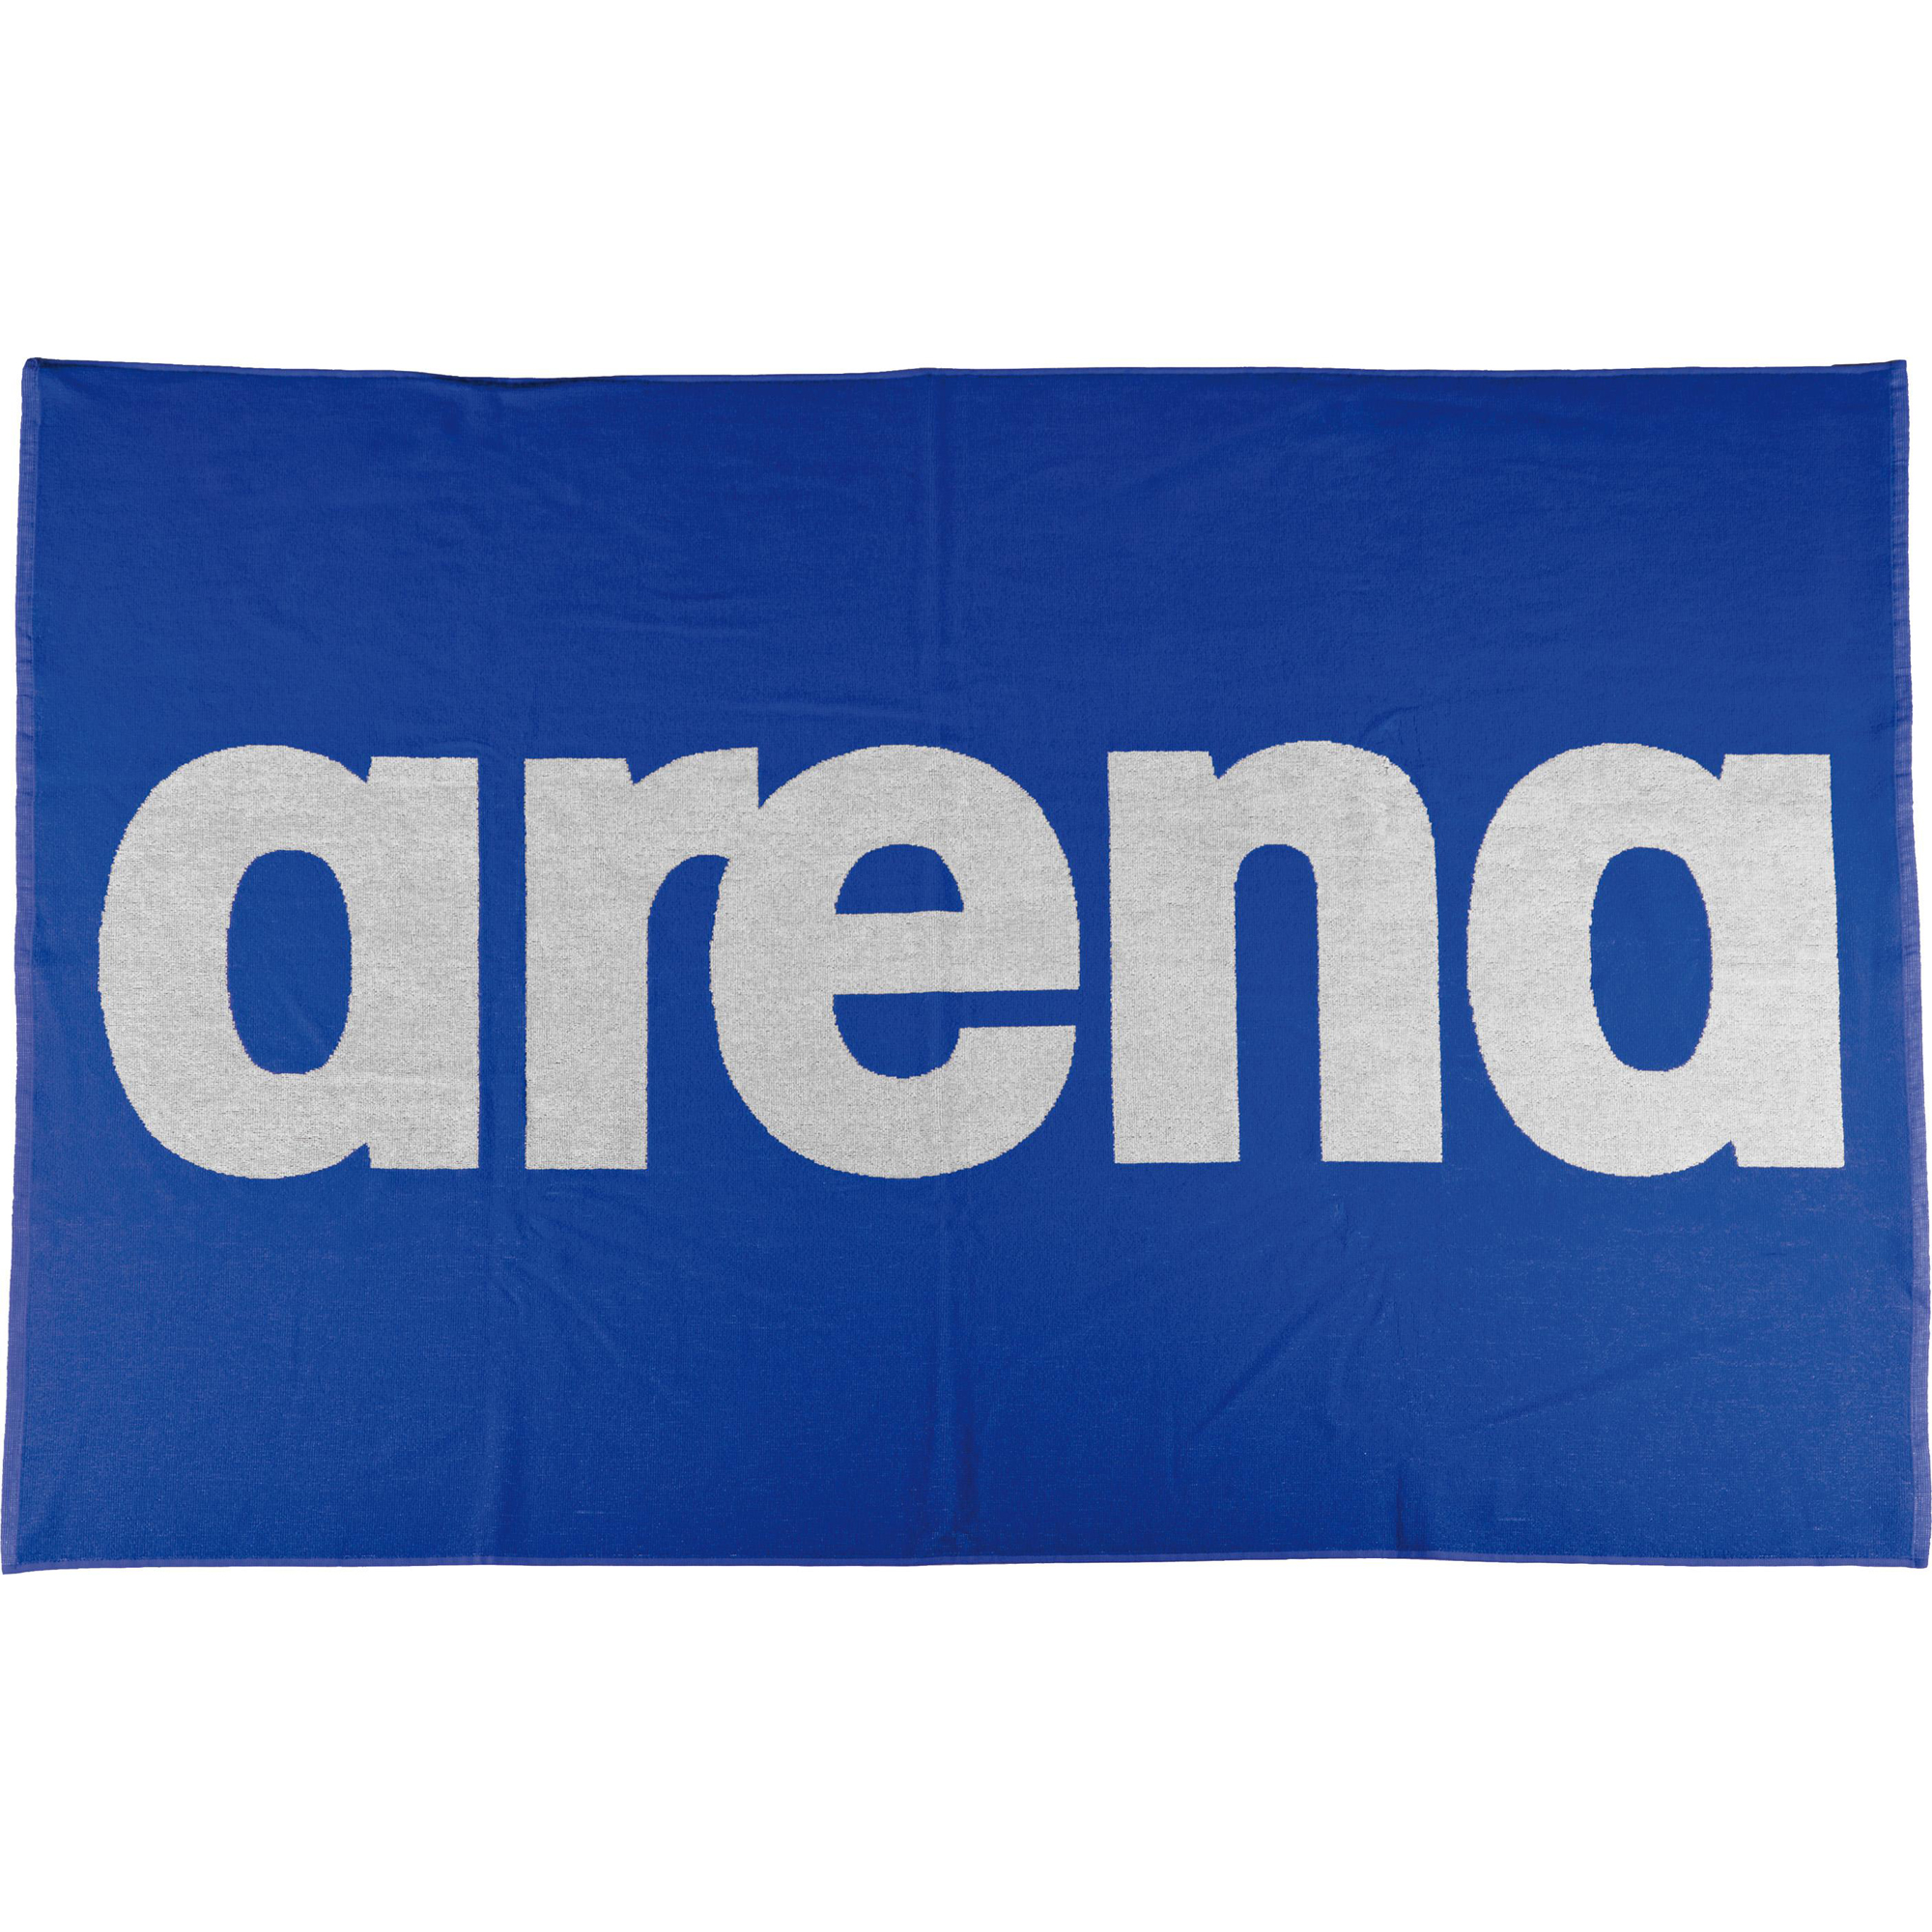 Arena Handtuch groß Handy 2A490-81